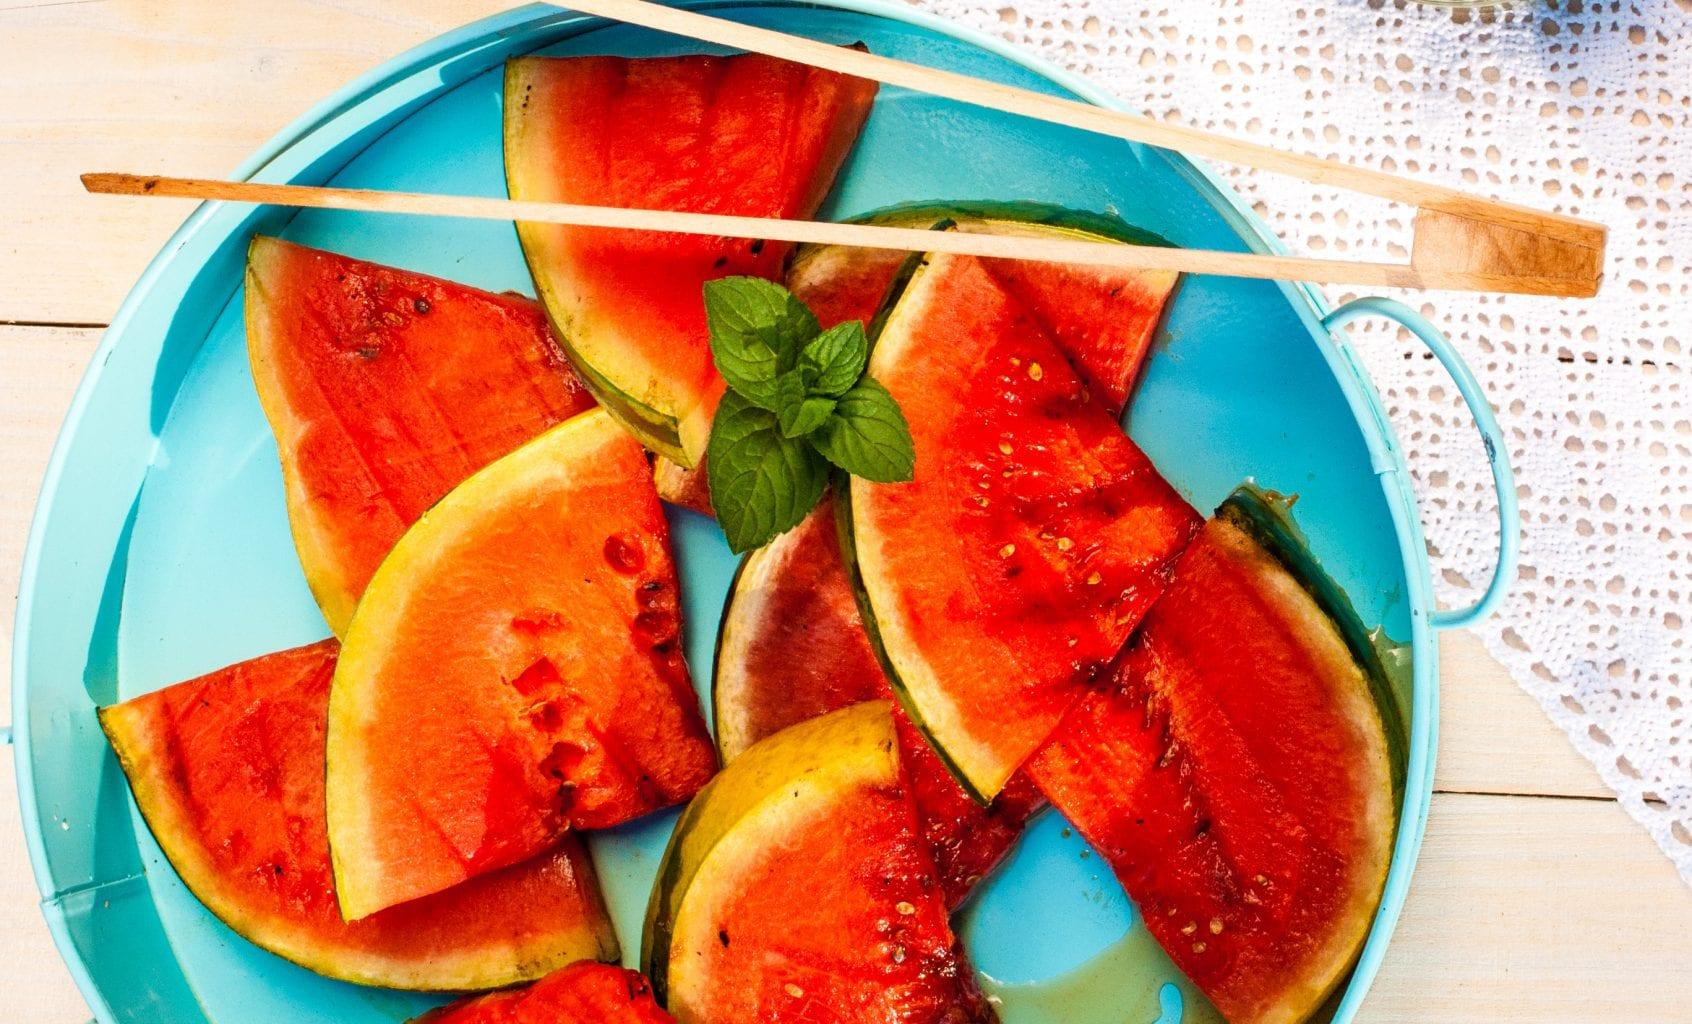 grilovany melon recept